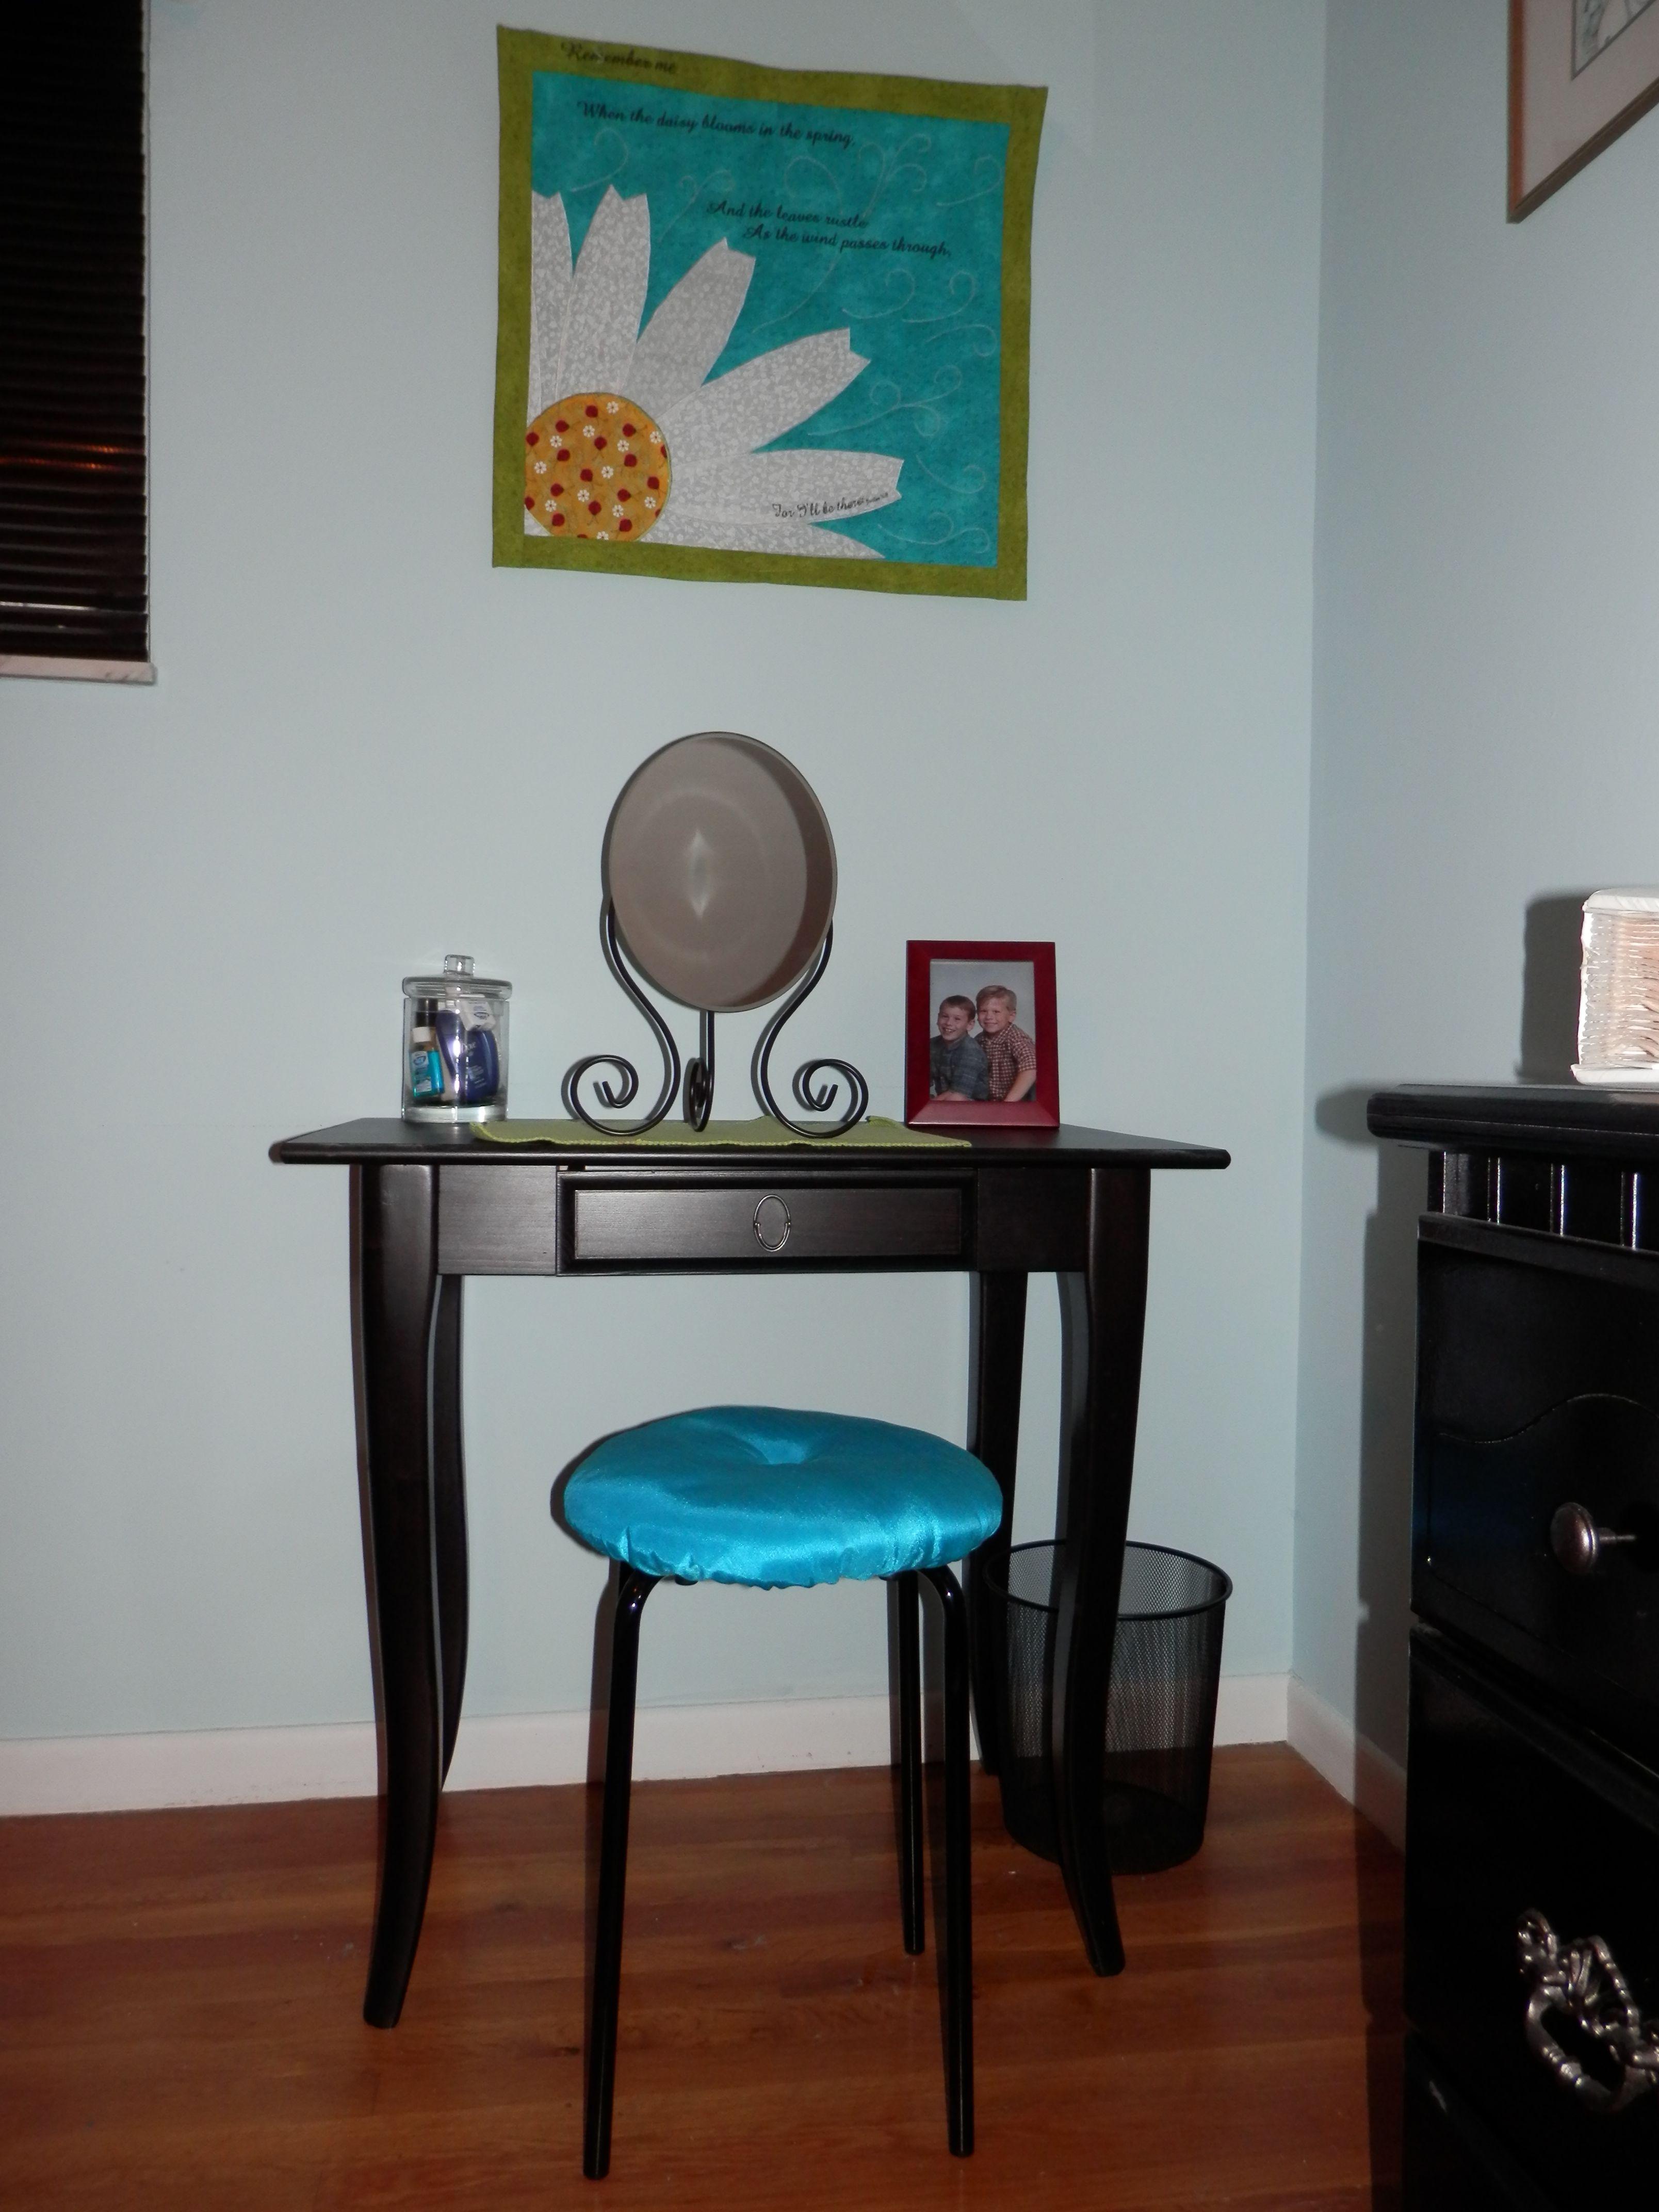 Ikea guest room vanity leksvik desk myken mirror i added a bar